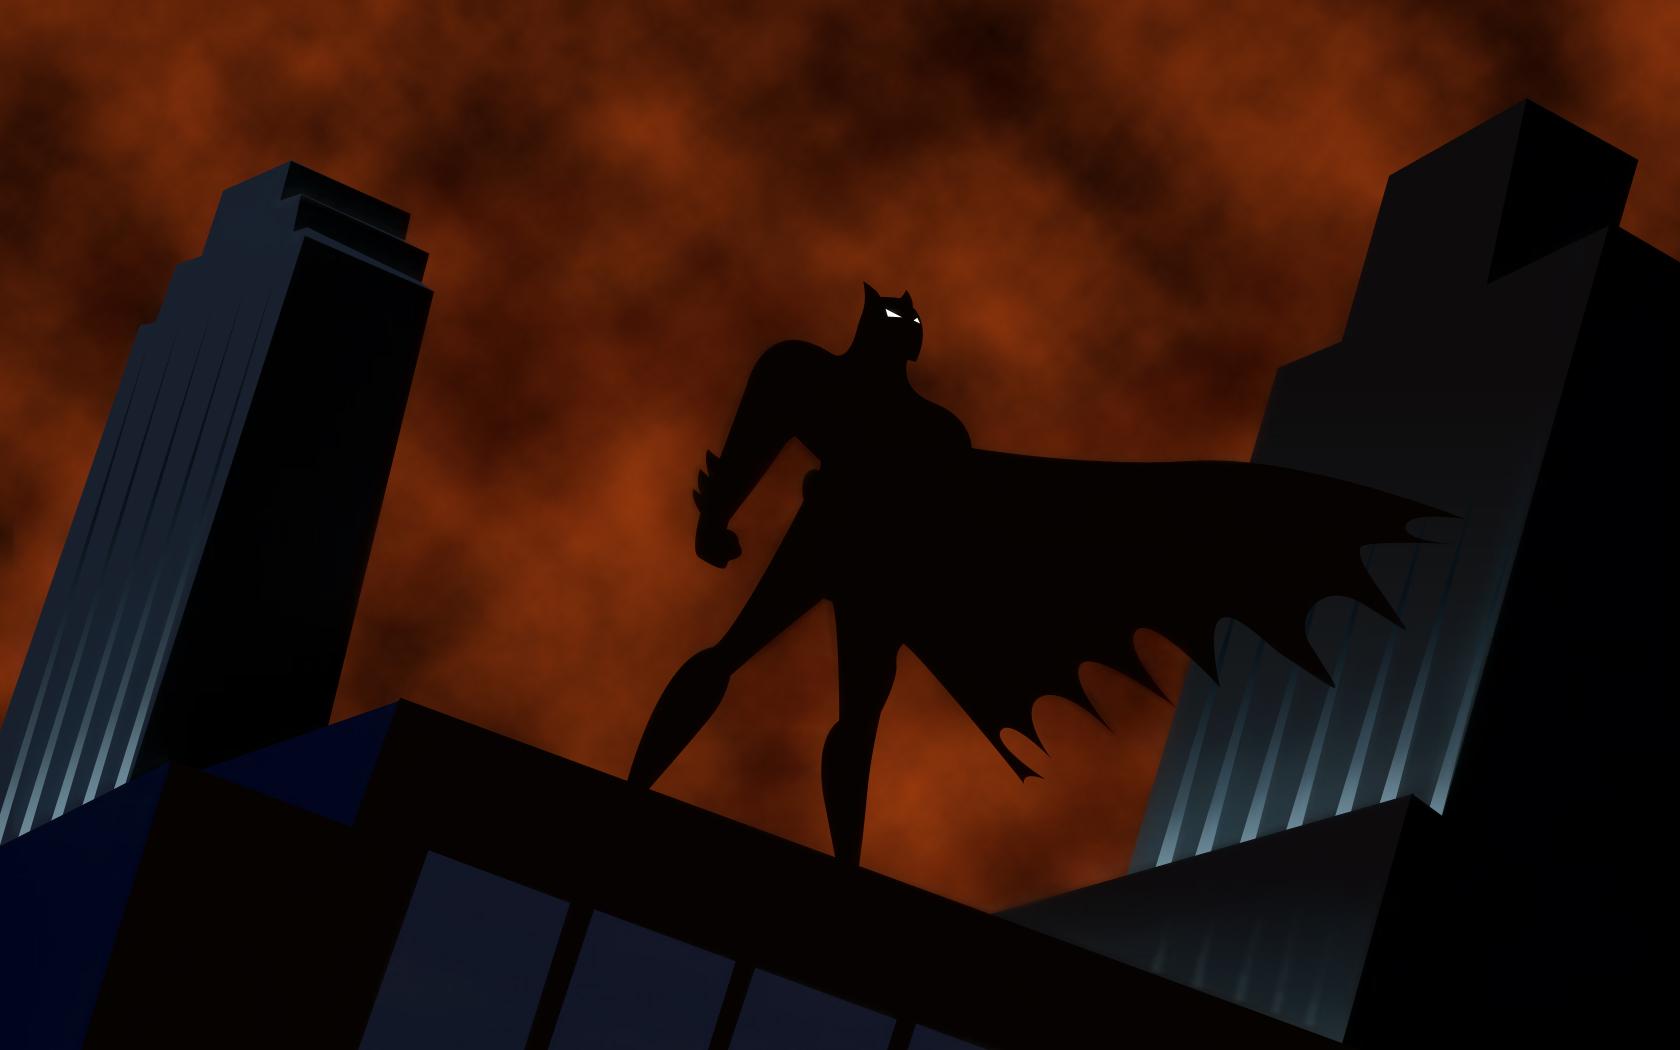 batman-animated-wallpaper.jpg